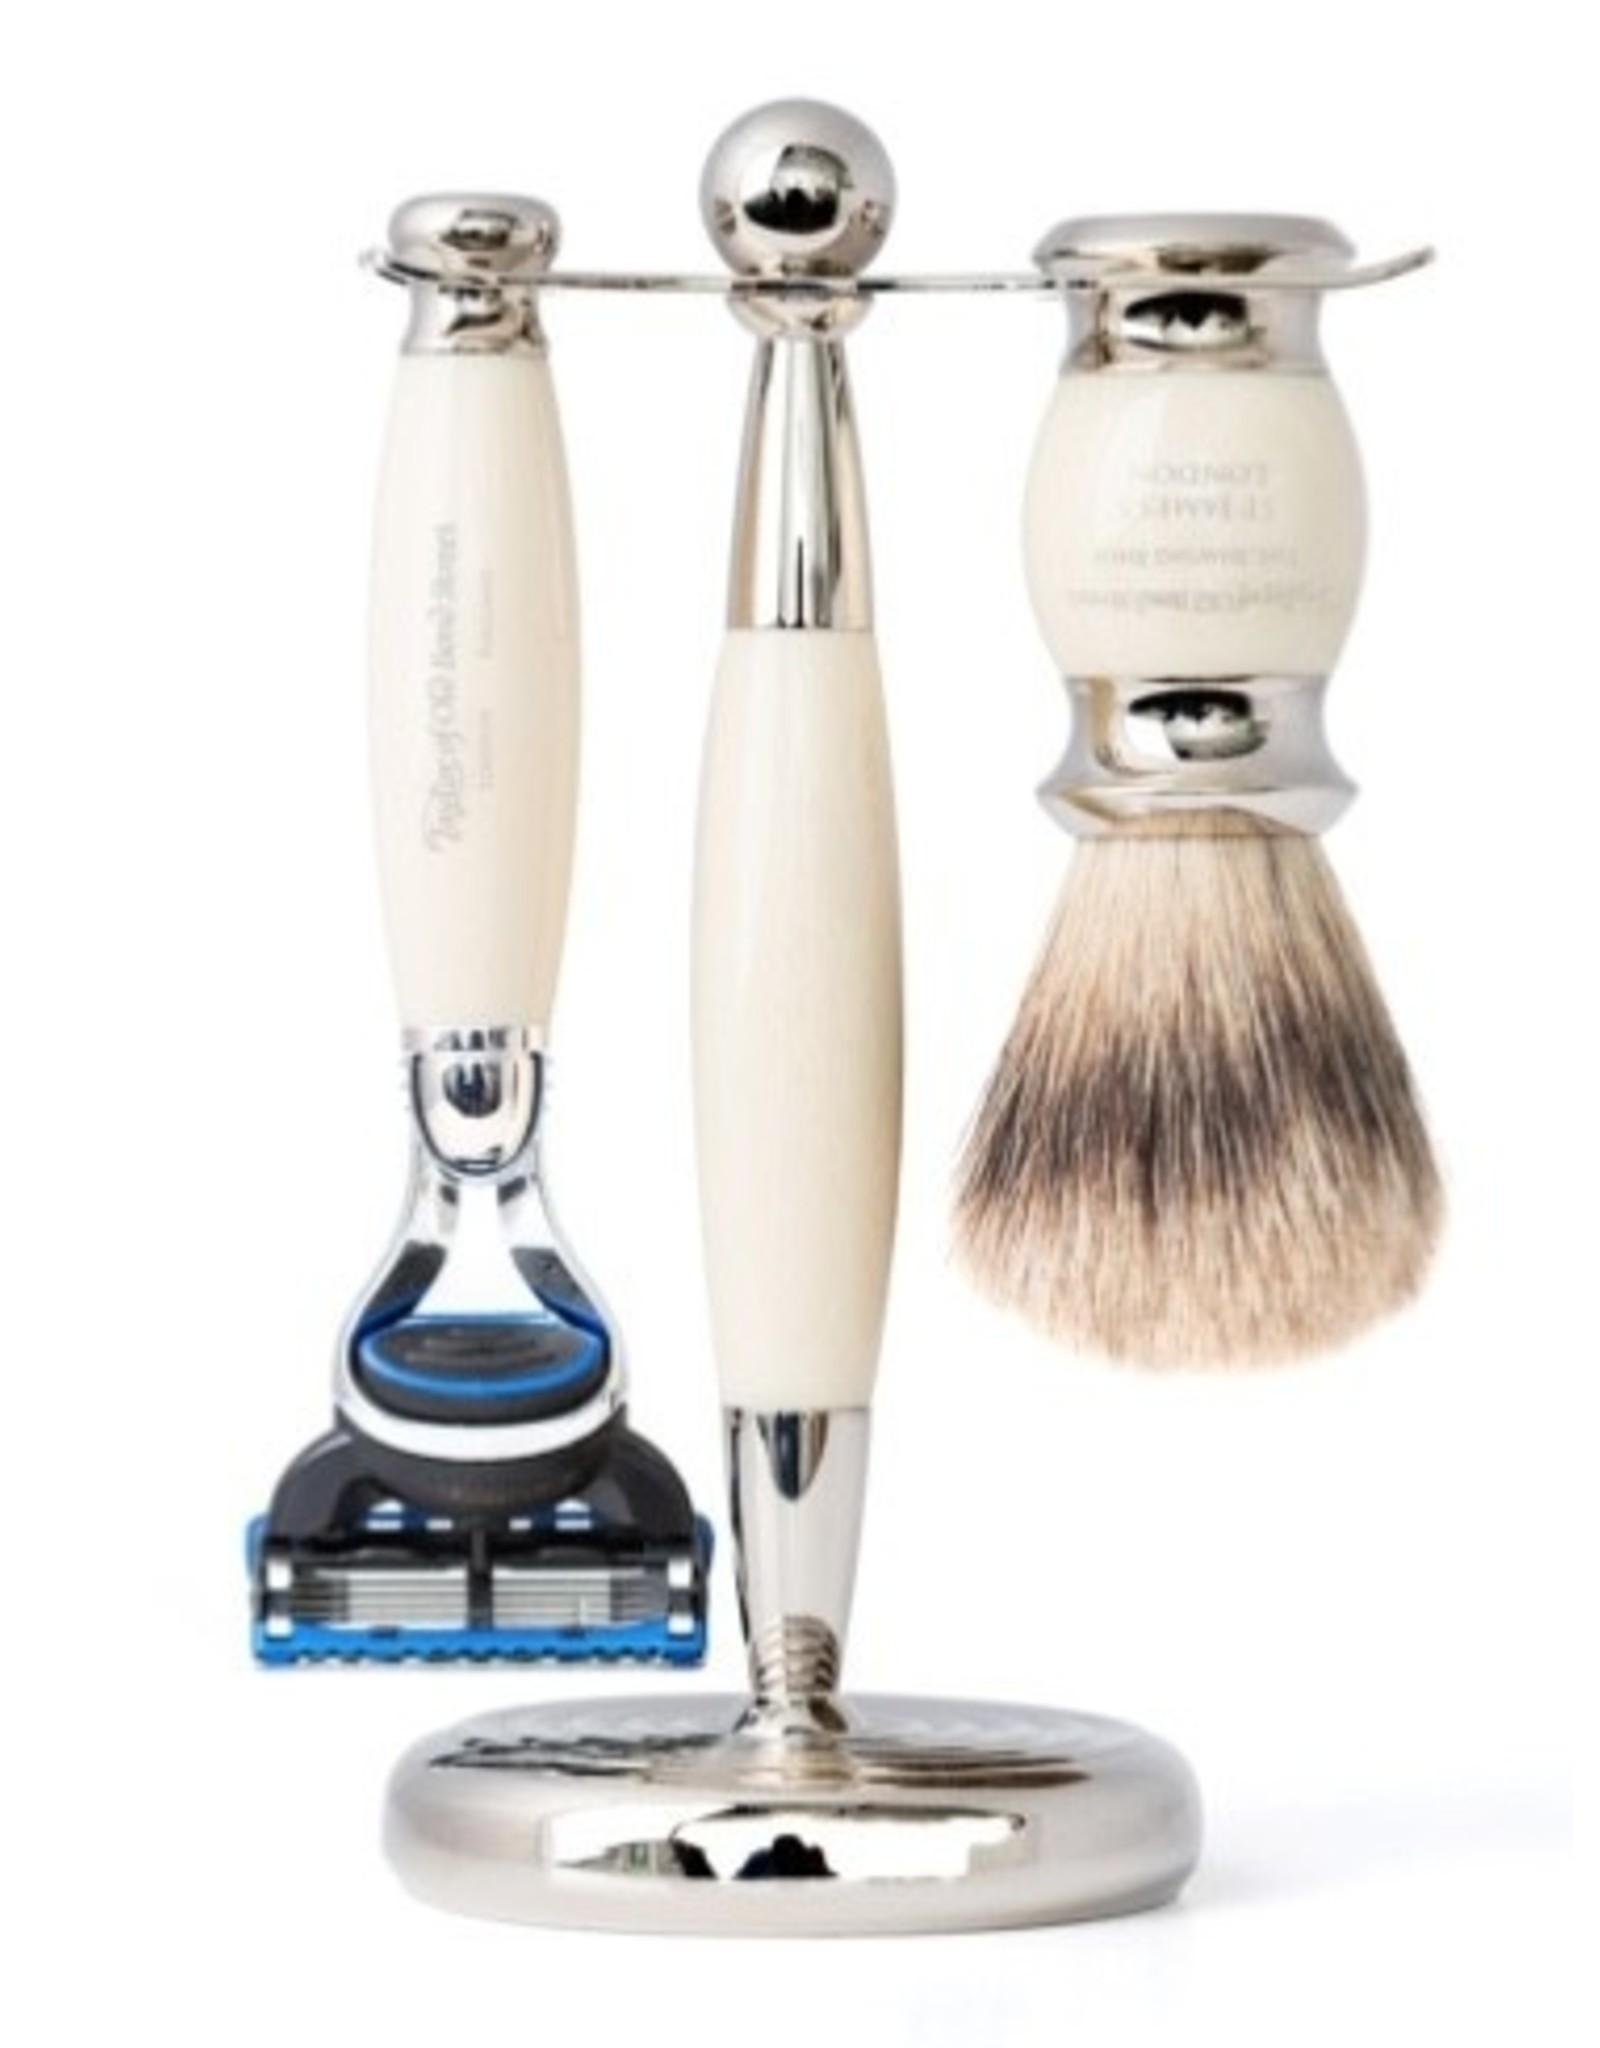 Taylor of Old Bond Street Super Fusion Shaving Set